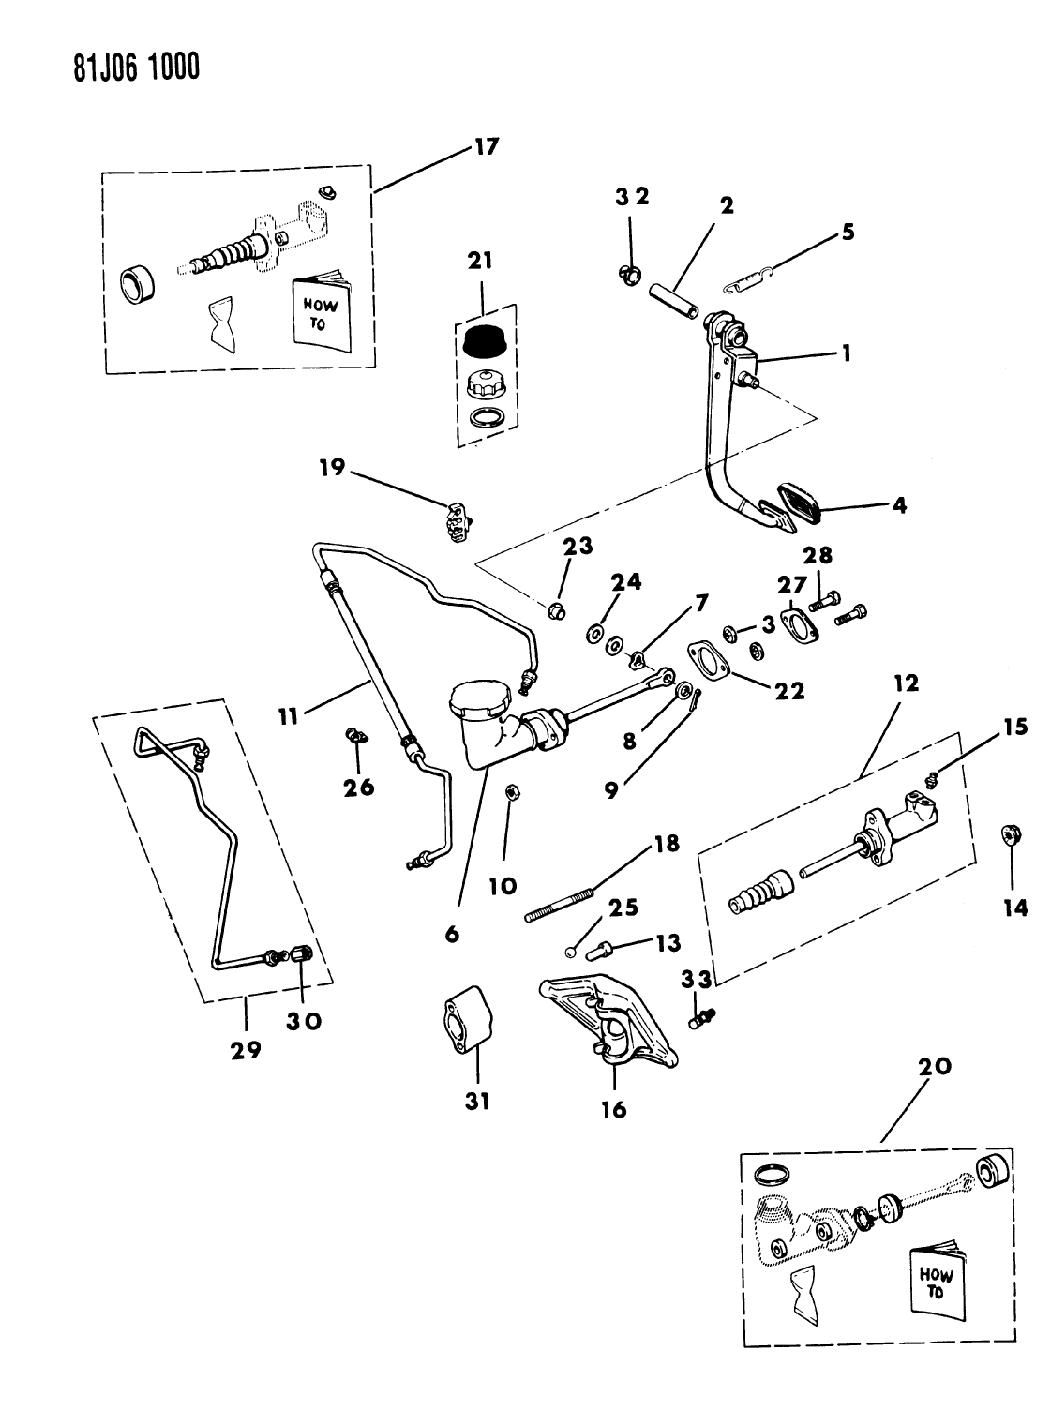 1986 jeep cherokee pedal - clutch linkage